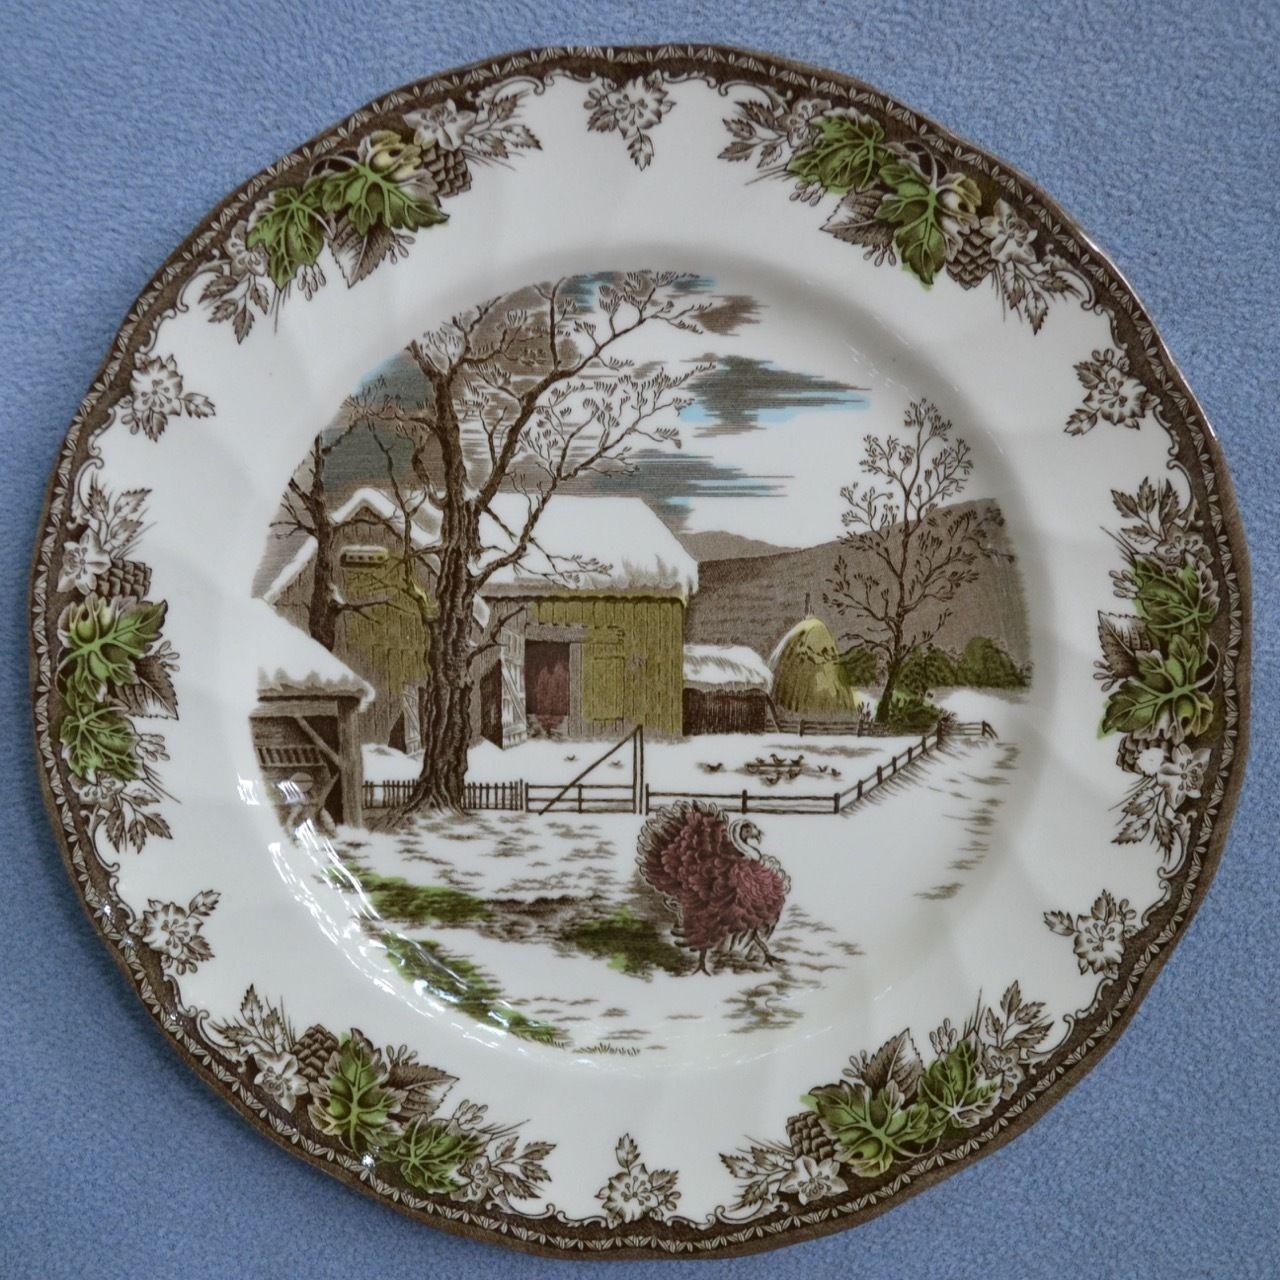 Vintage Johnson Brothers Friendly Village Buffet Dinner Plates w Turkey England | eBay & Vintage Johnson Brothers Friendly Village Buffet Dinner Plates w ...